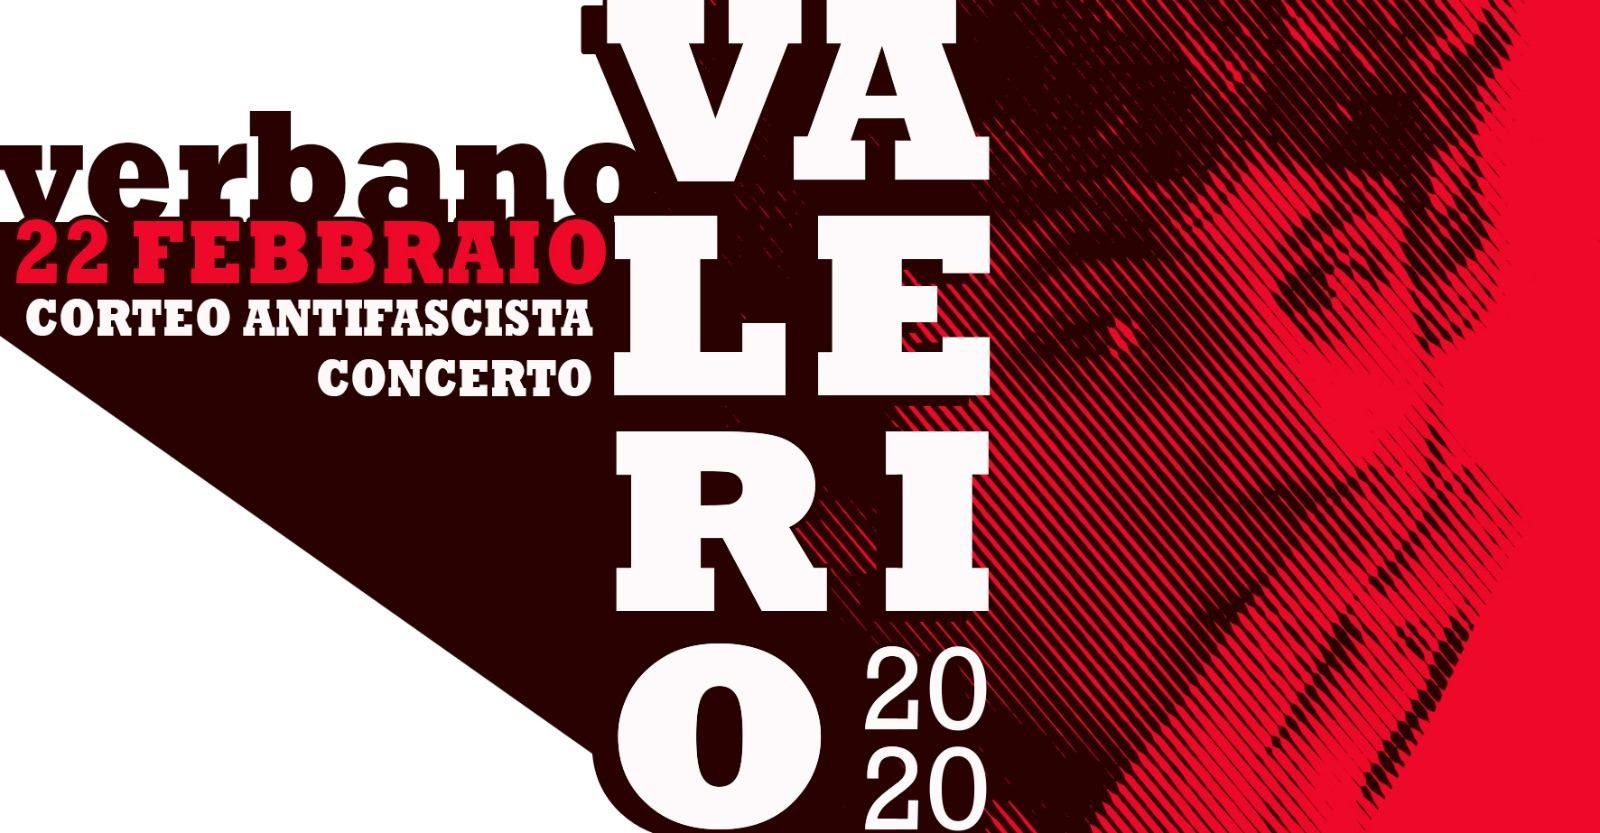 Sabato 22 Febbraio/ Valerio Vive